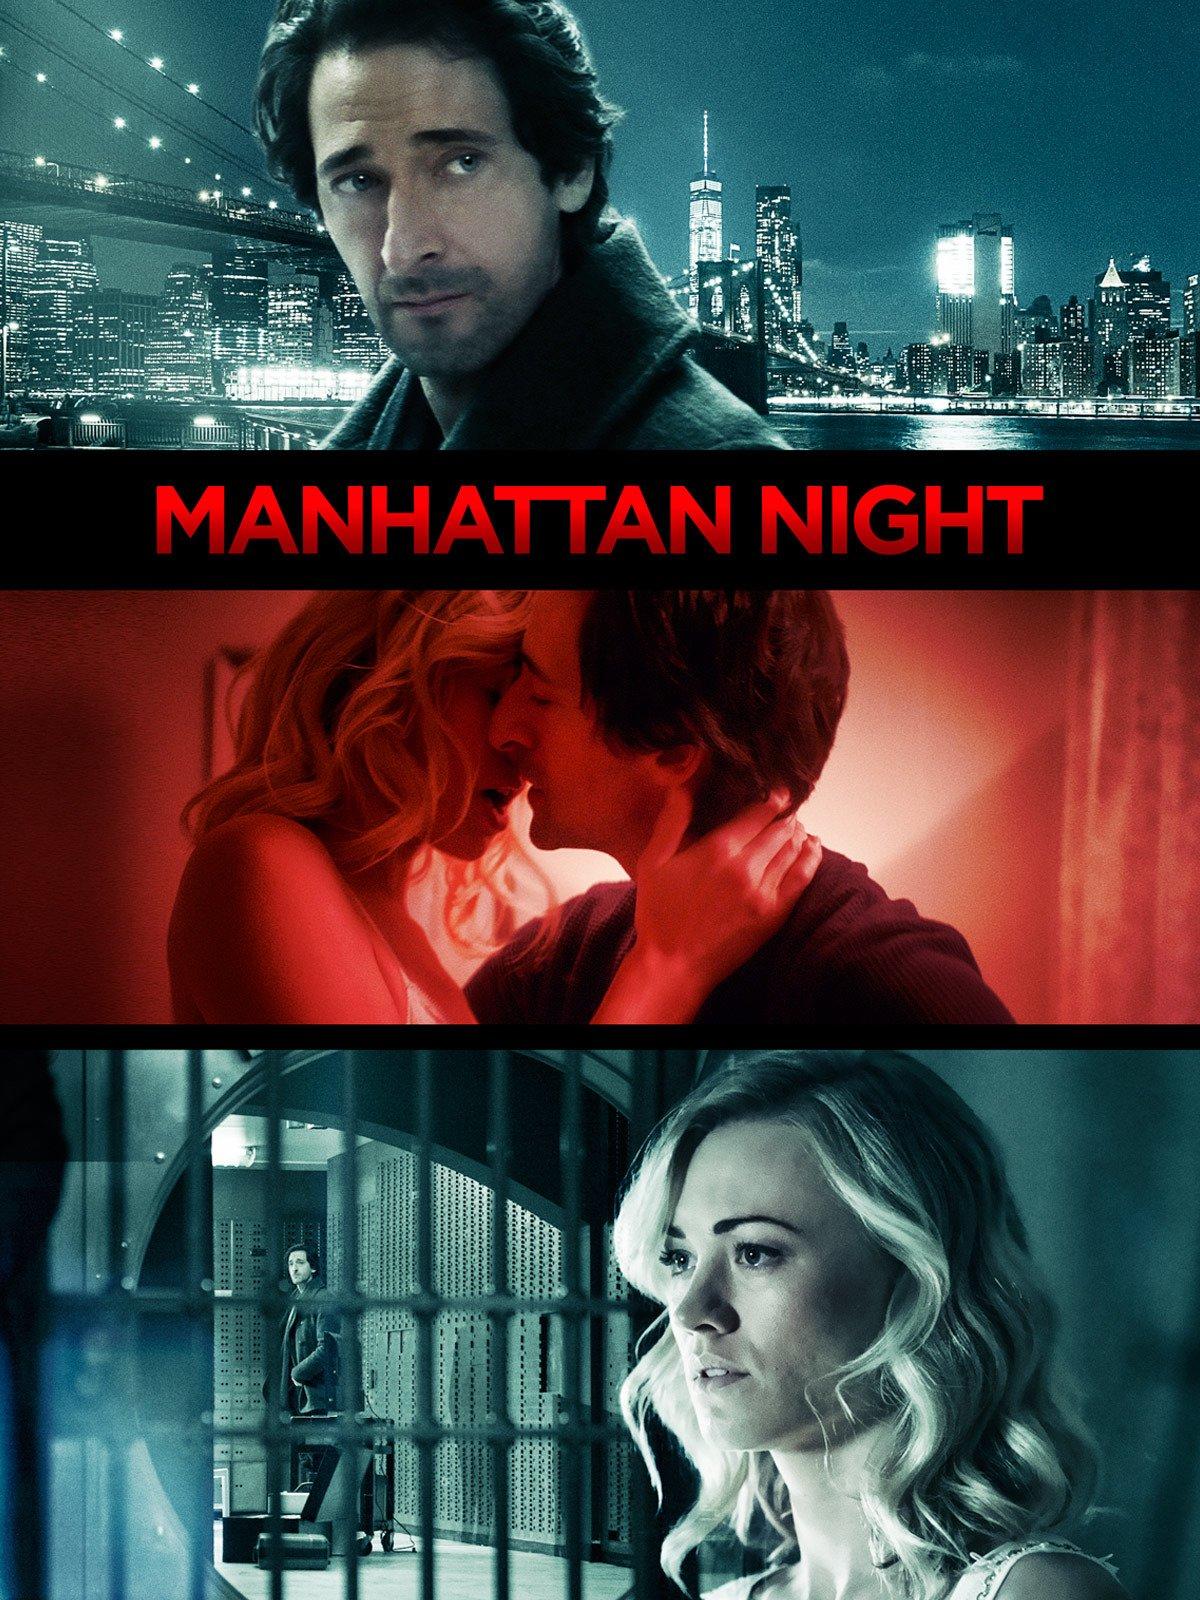 Manhattan Night